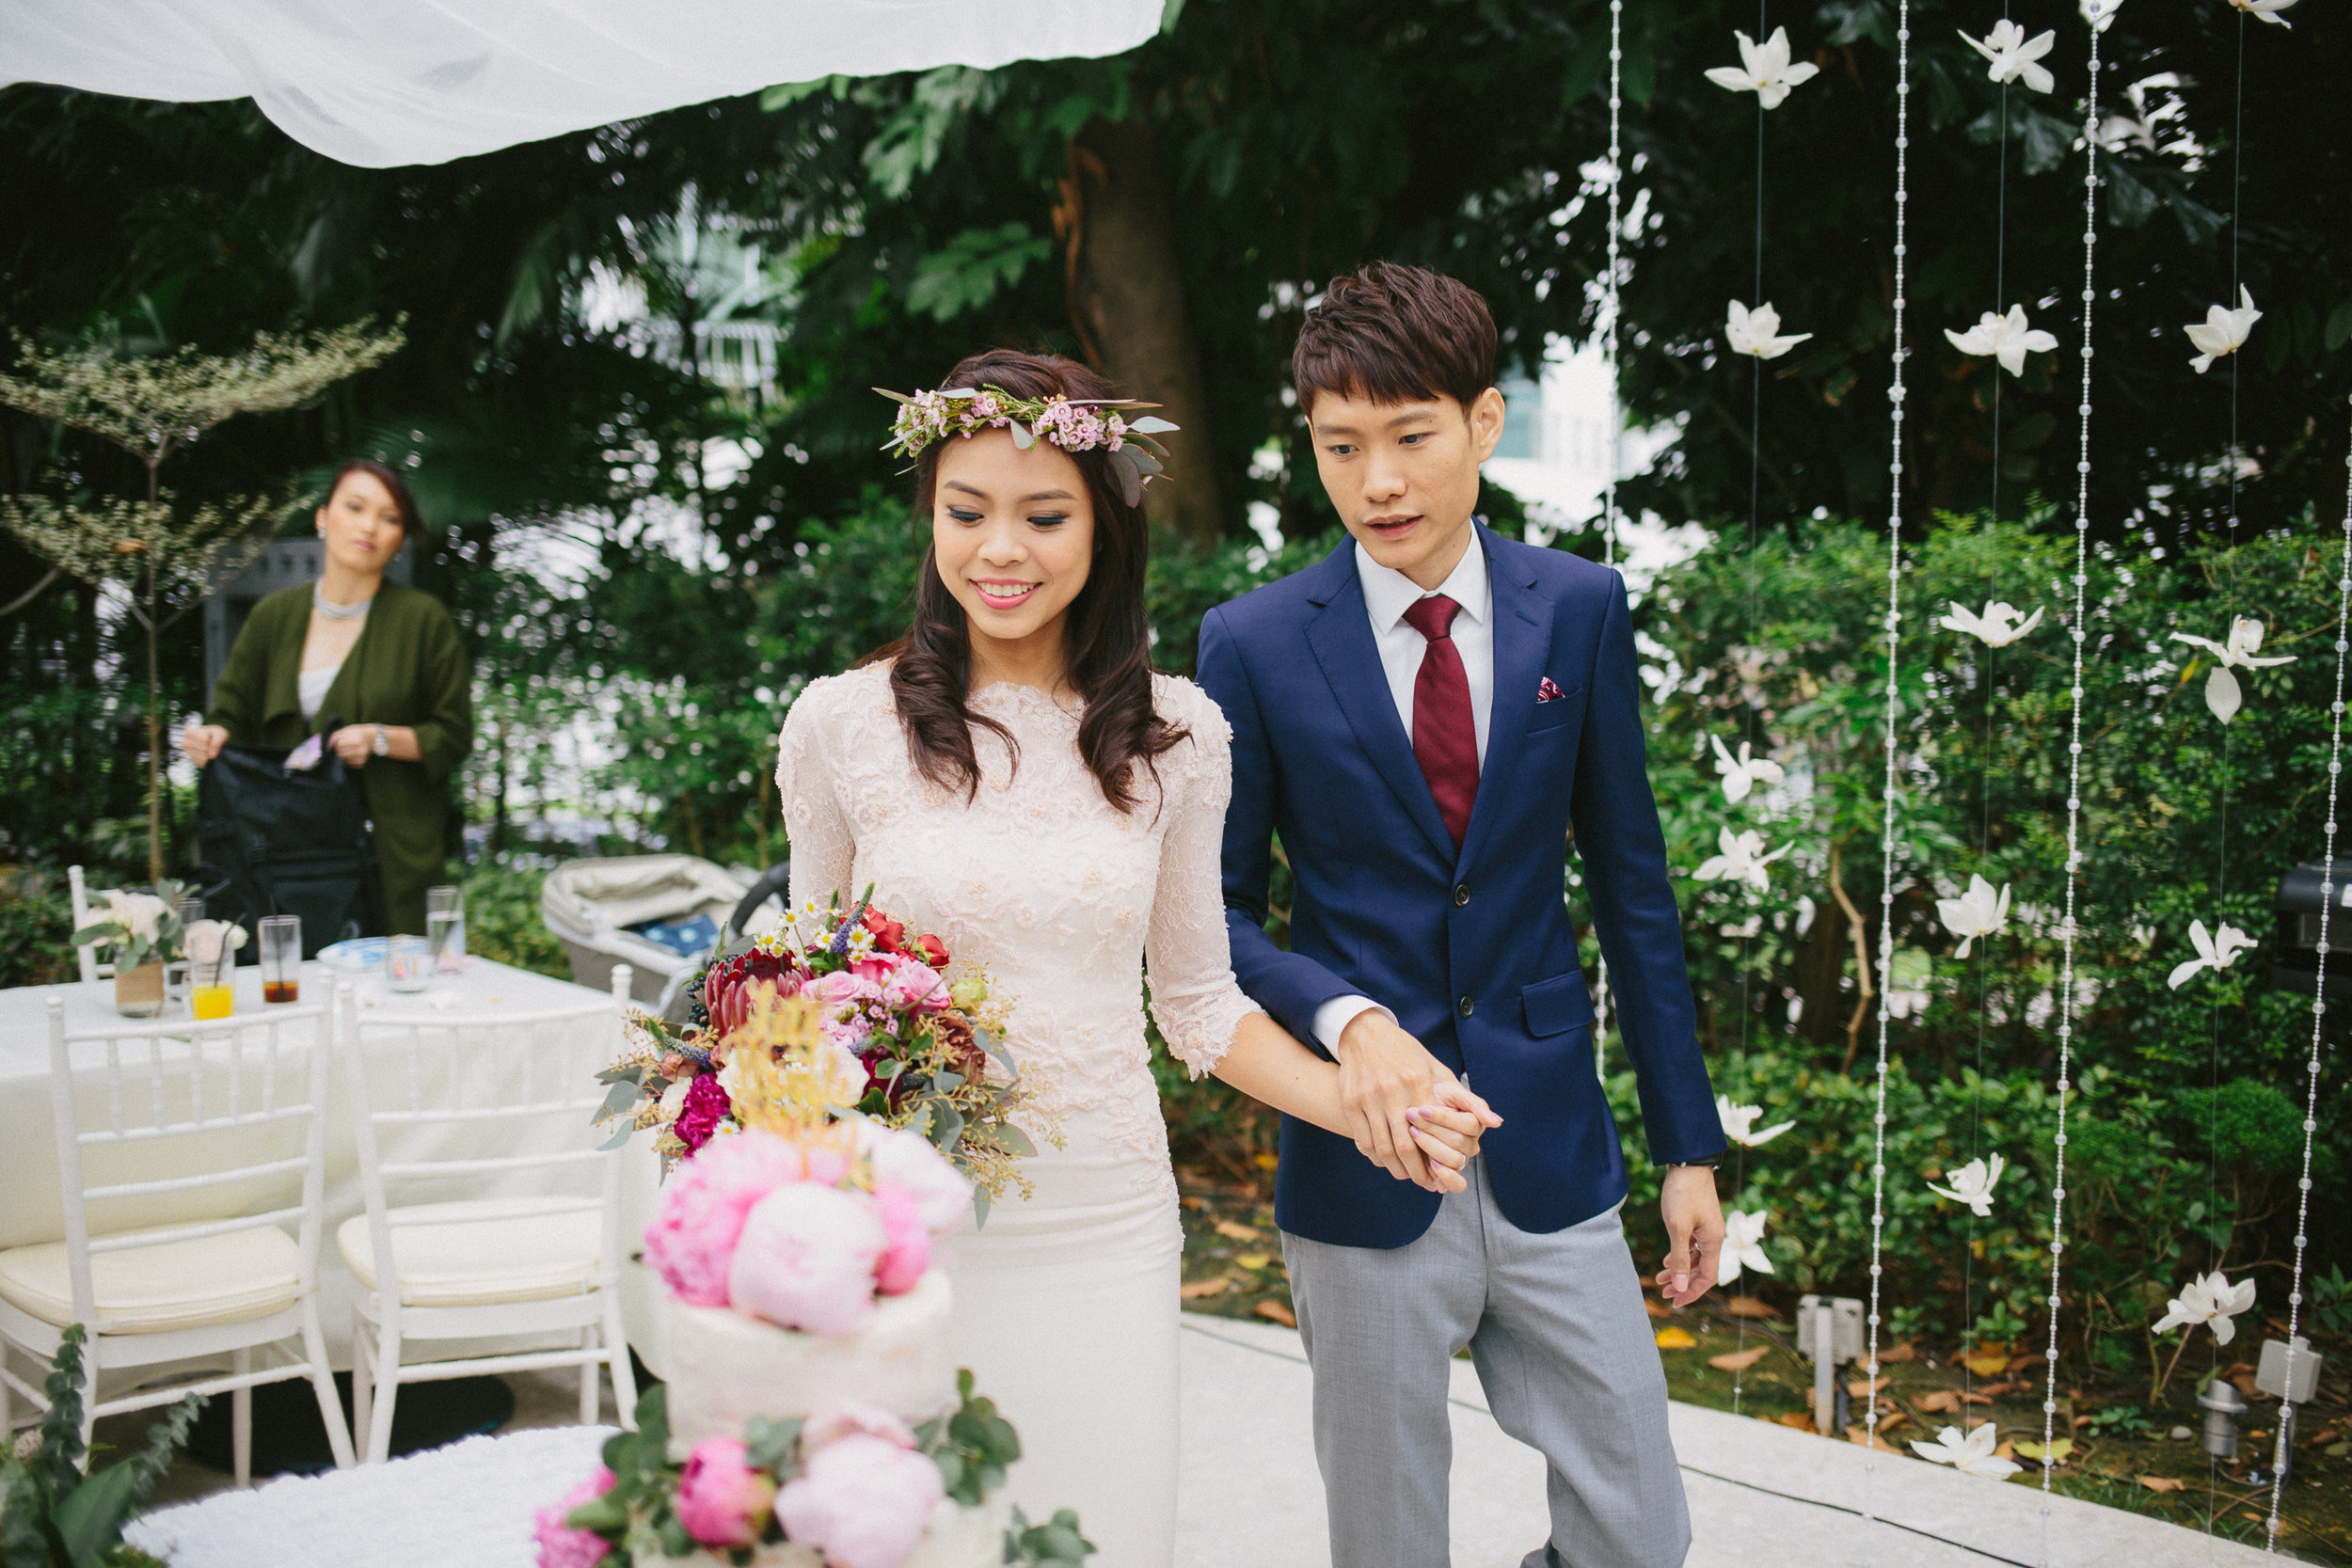 singapore-wedding-photographer-fadilah-kwan-059.jpg